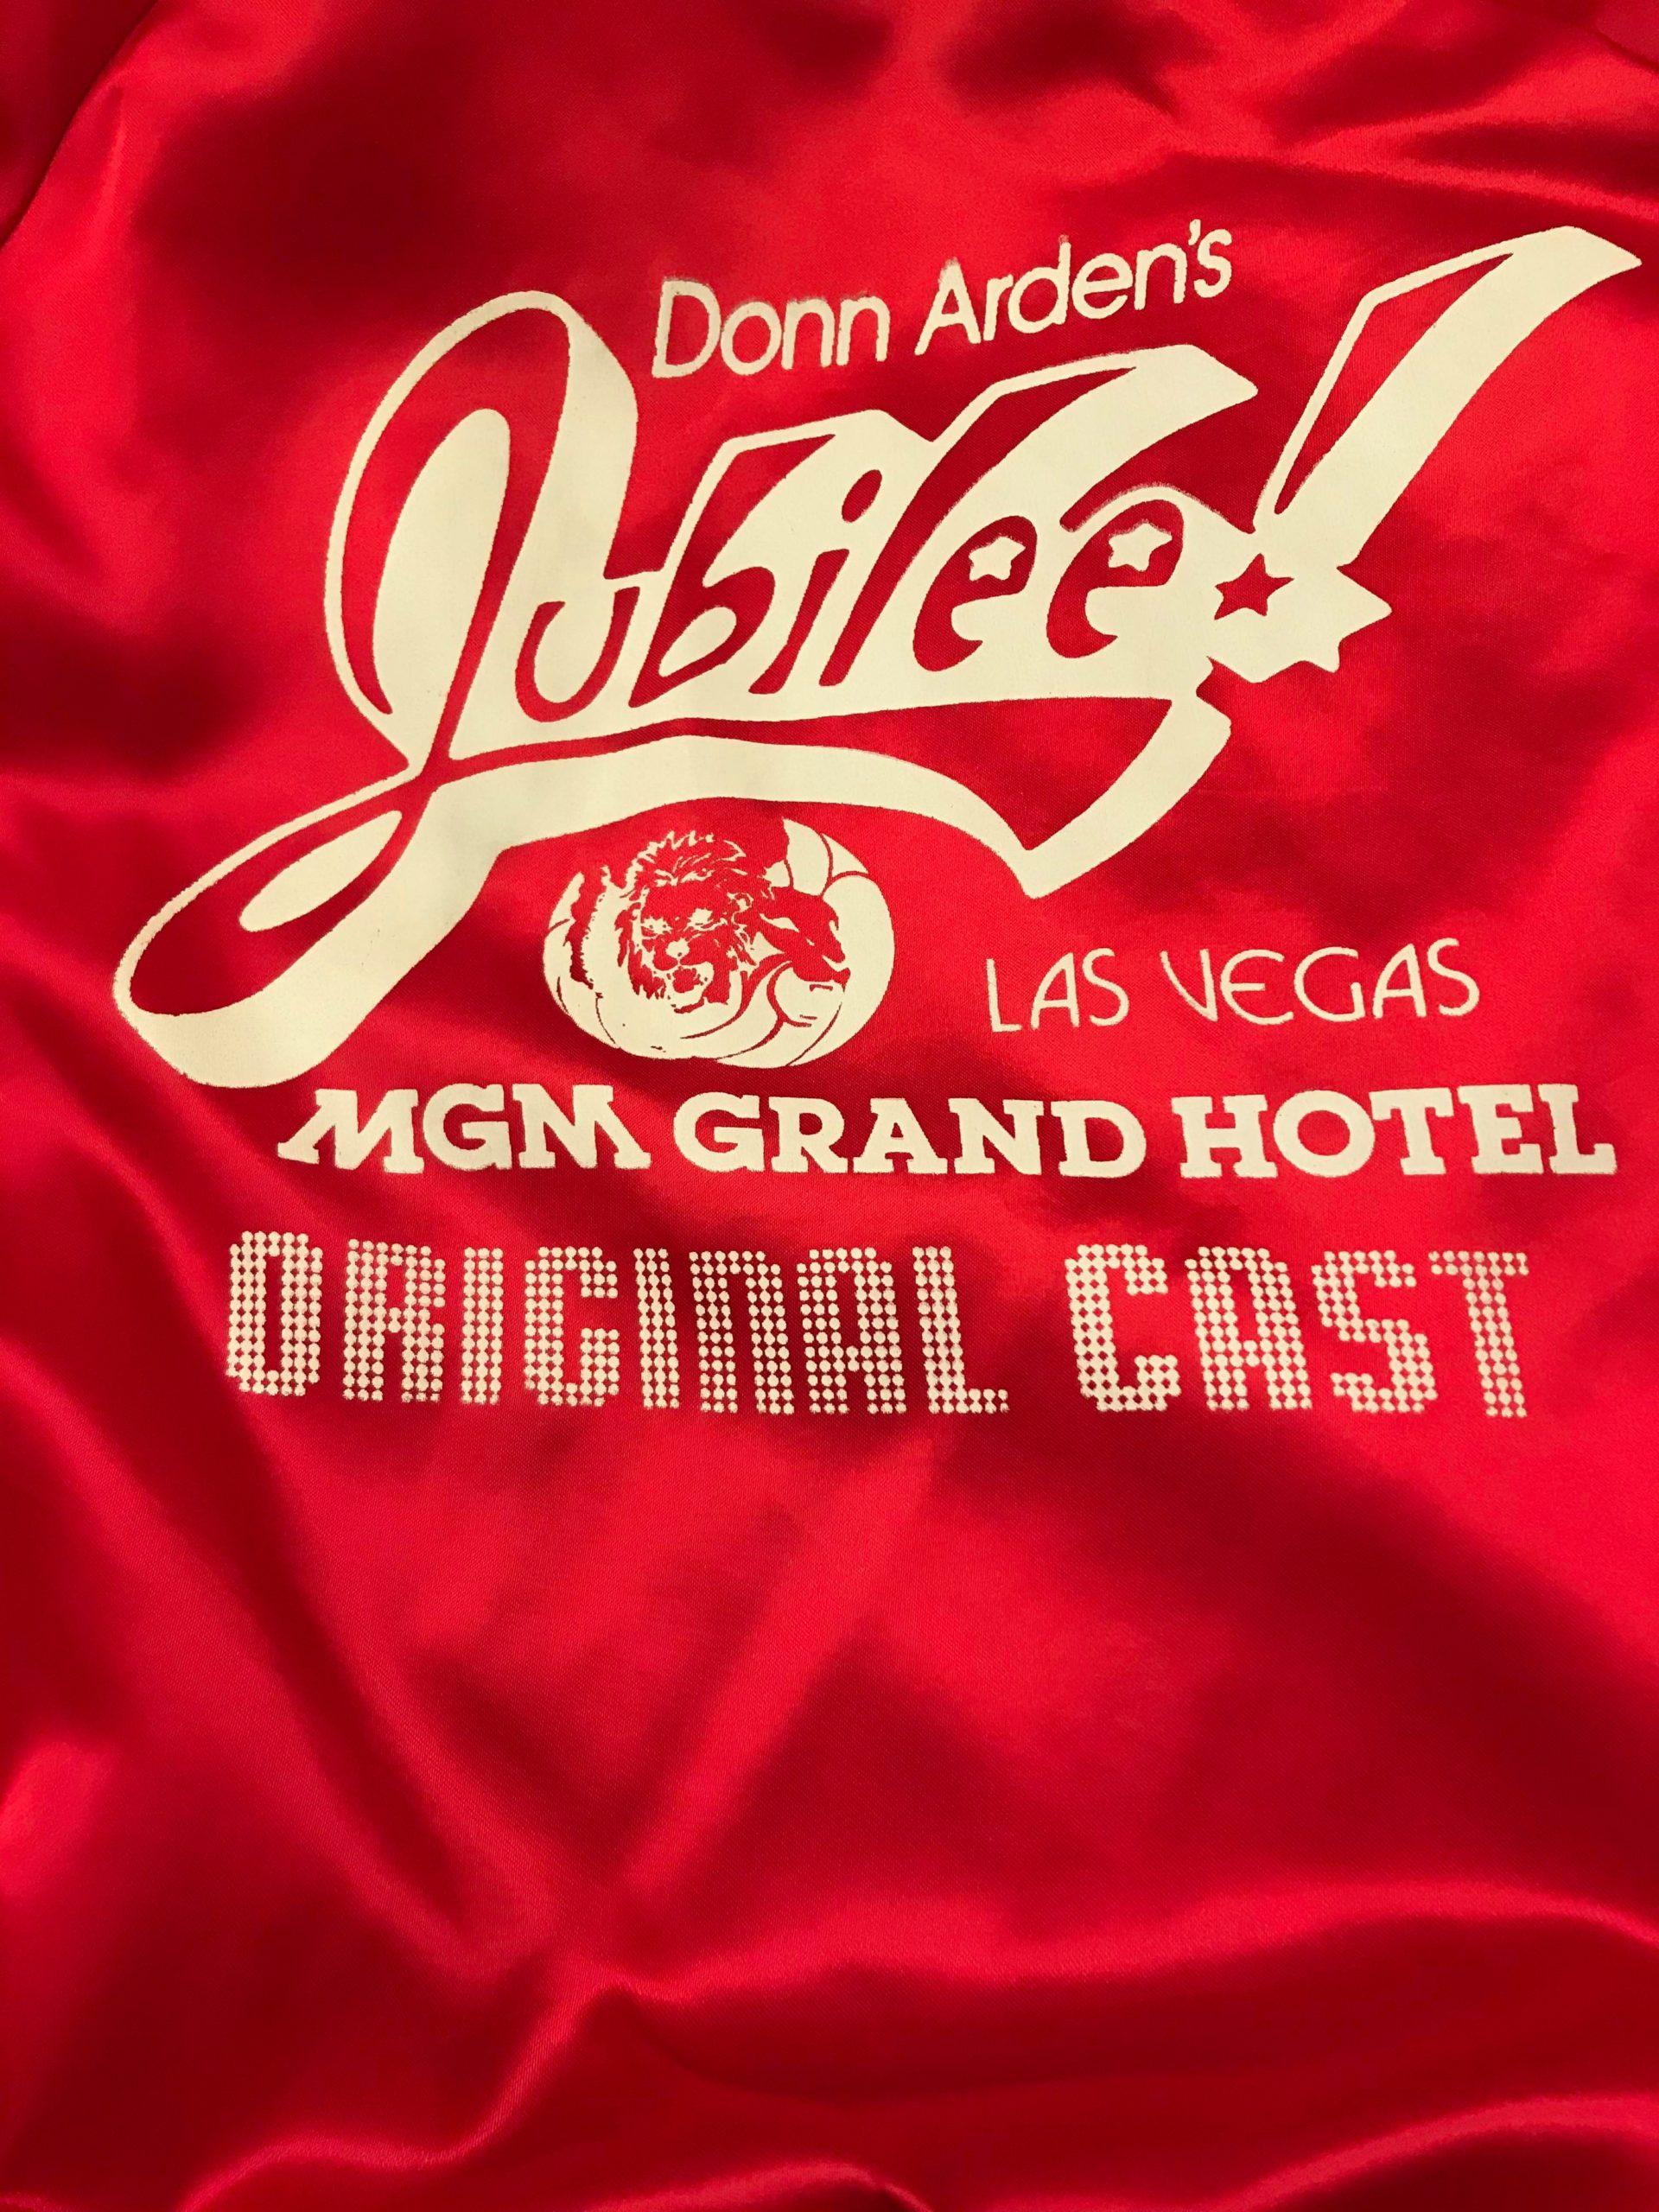 Donn Arden's Jubilee! MGM Grand Hotel Las Vegas 1981, Original Cast jacket, courtesy of Rita Pardue